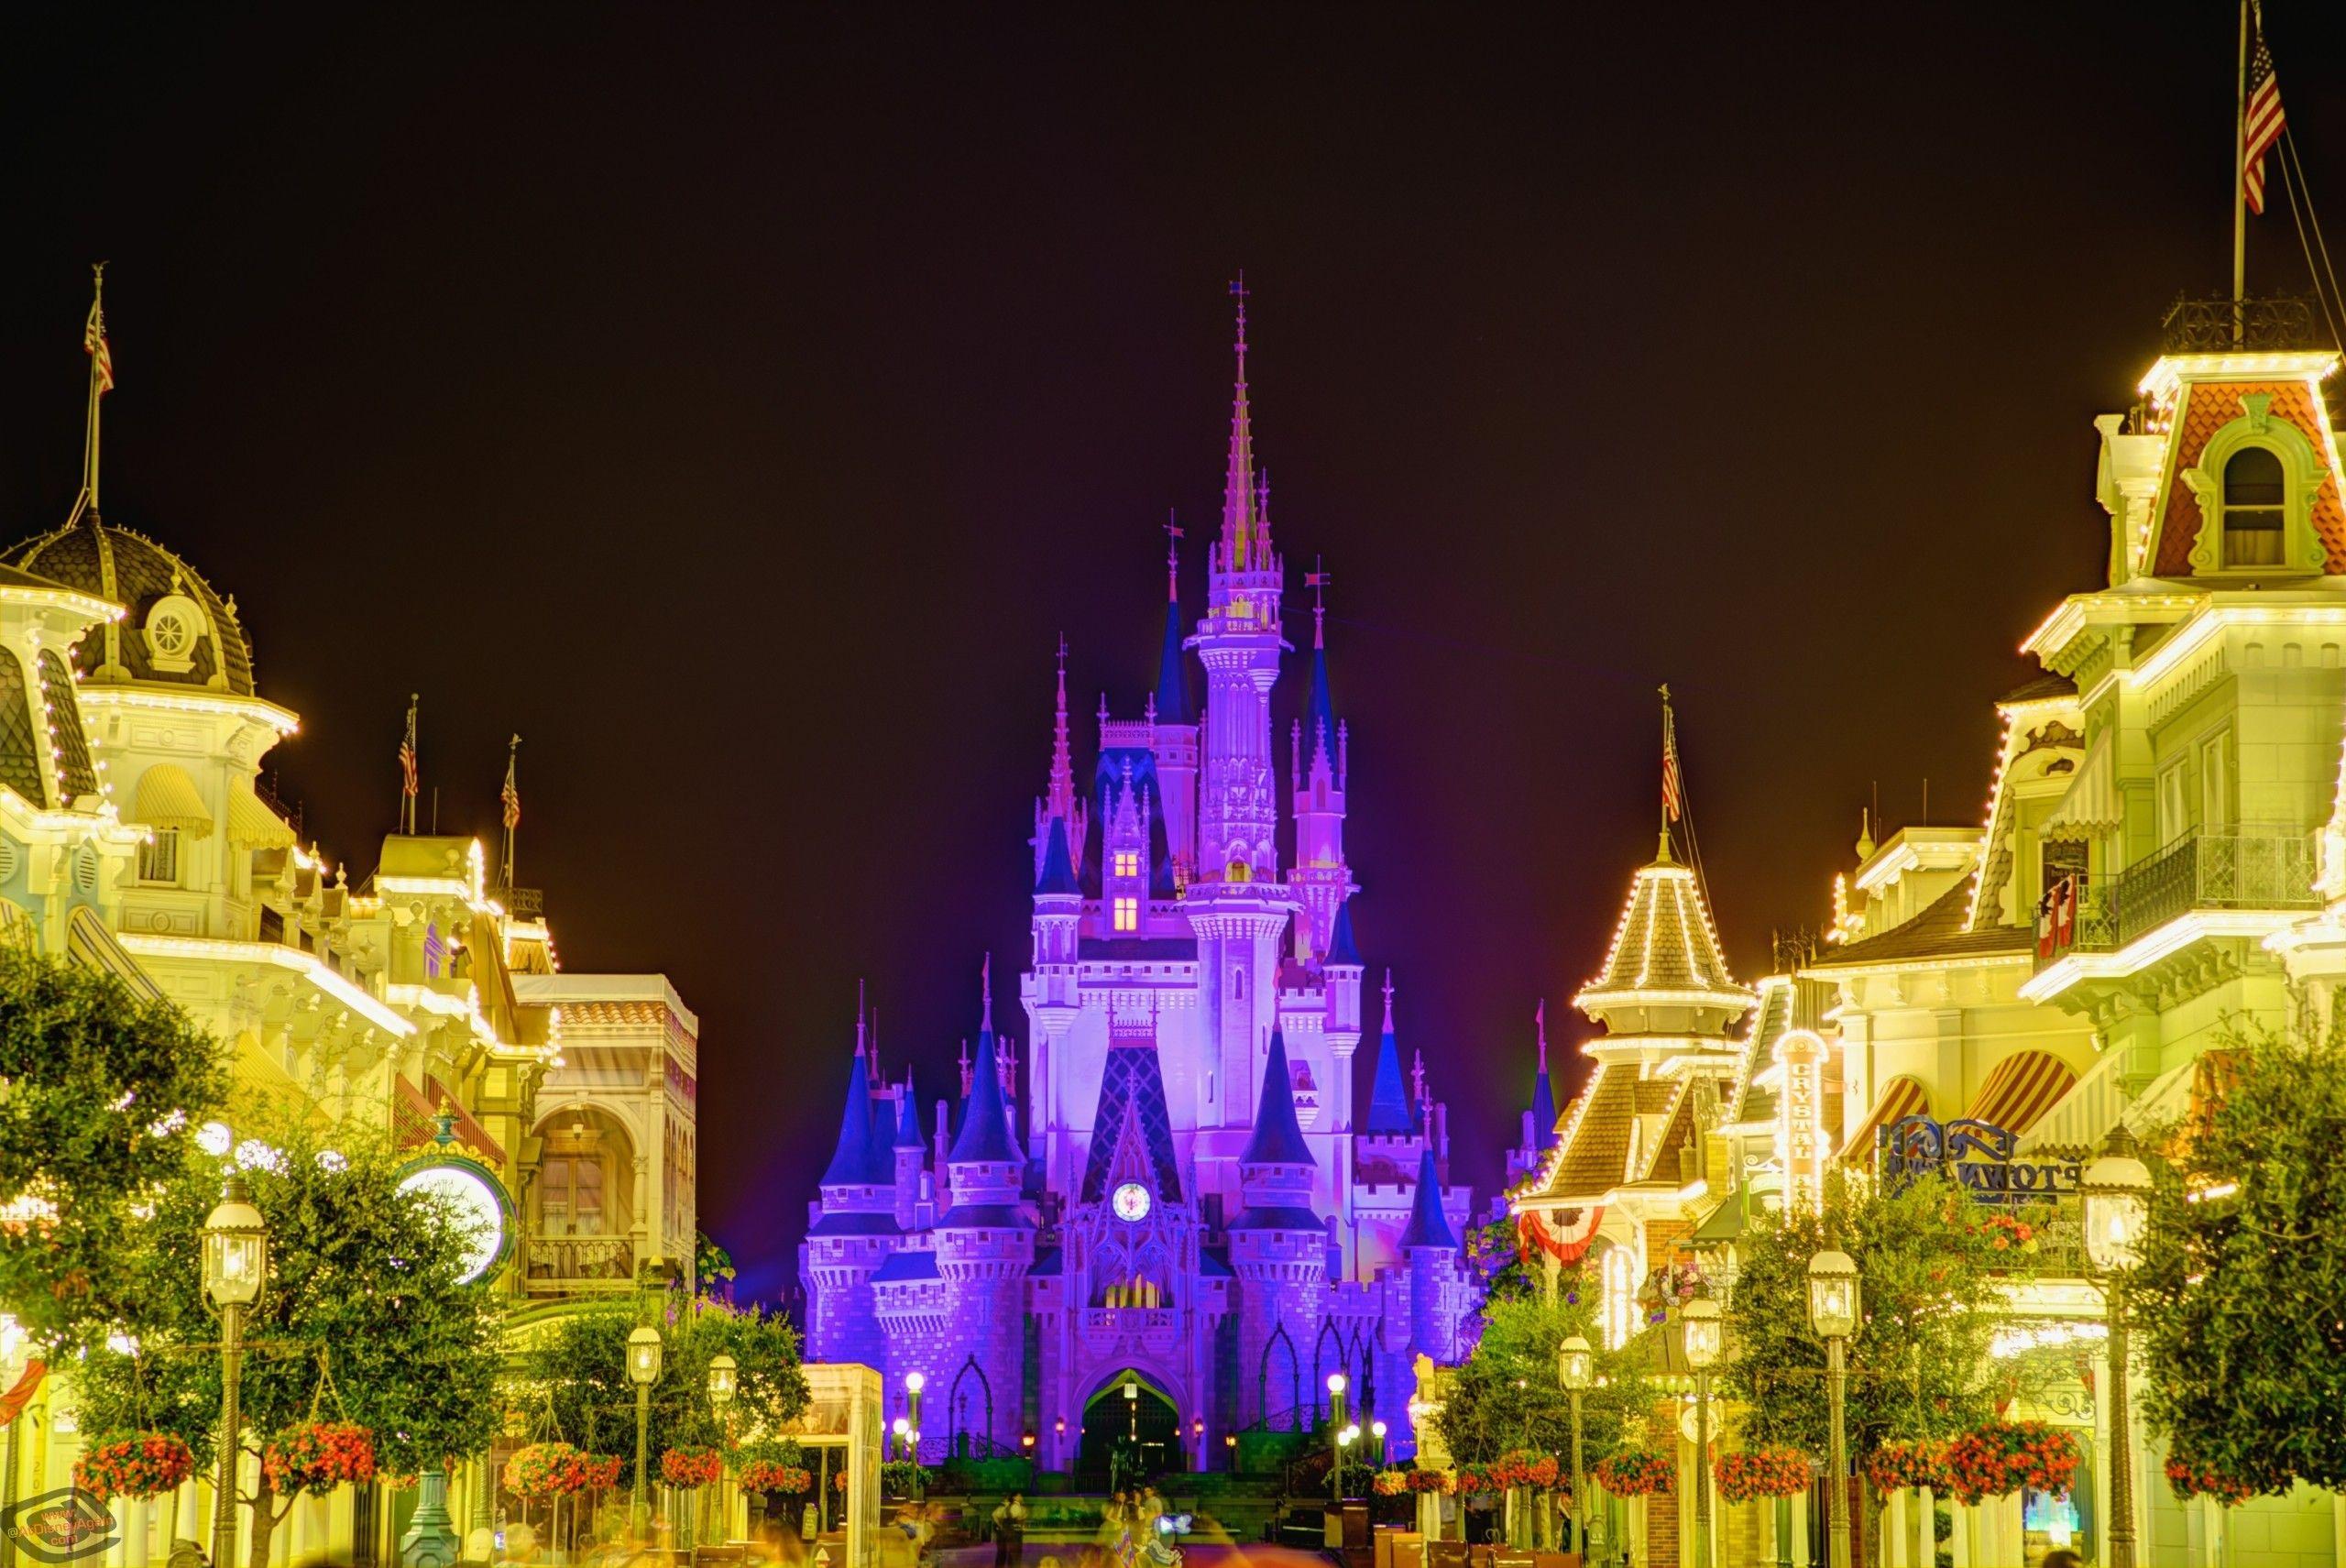 Disney World Castle Wallpapers On Wallpaperdog